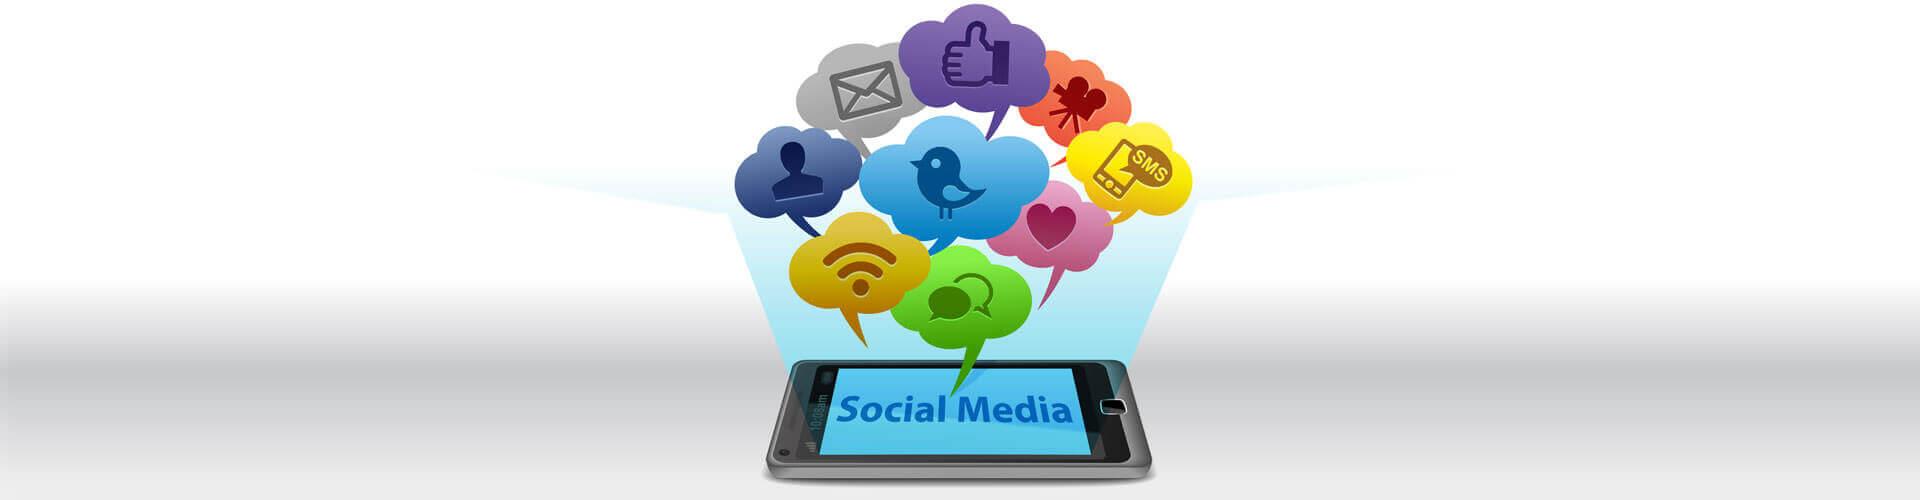 Six Tips for Social Media Marketing